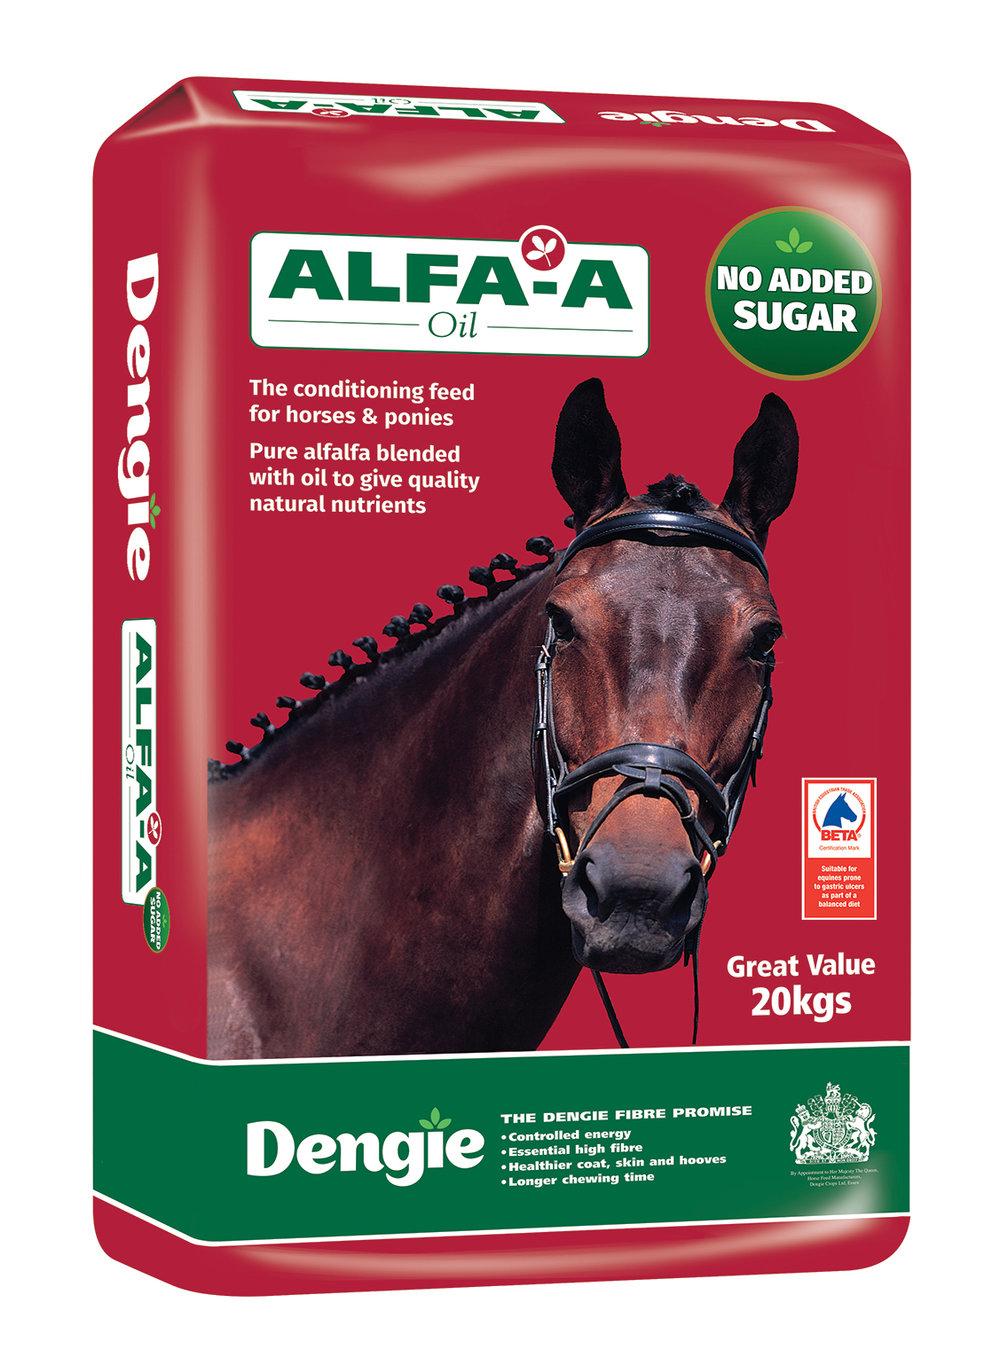 Dengie Alfa-A oil EGUS